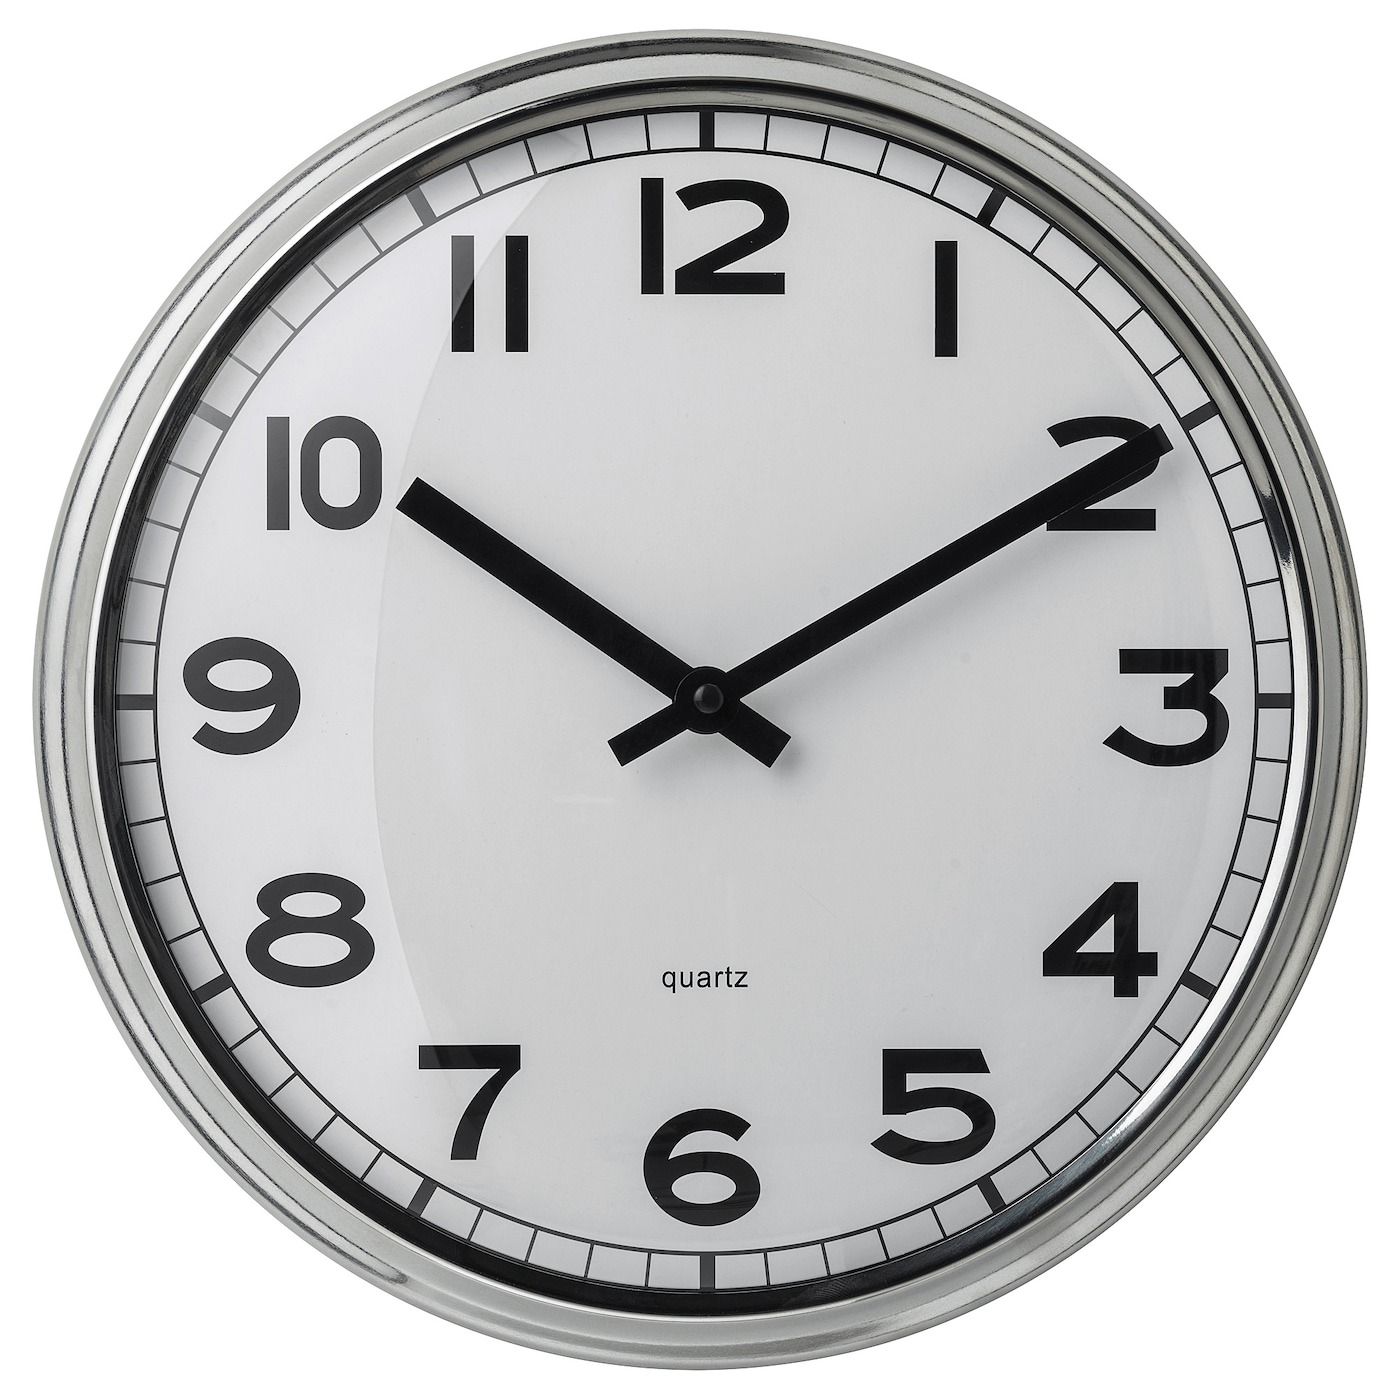 Relojes de pared y de mesa compra online ikea for Ikea orologi